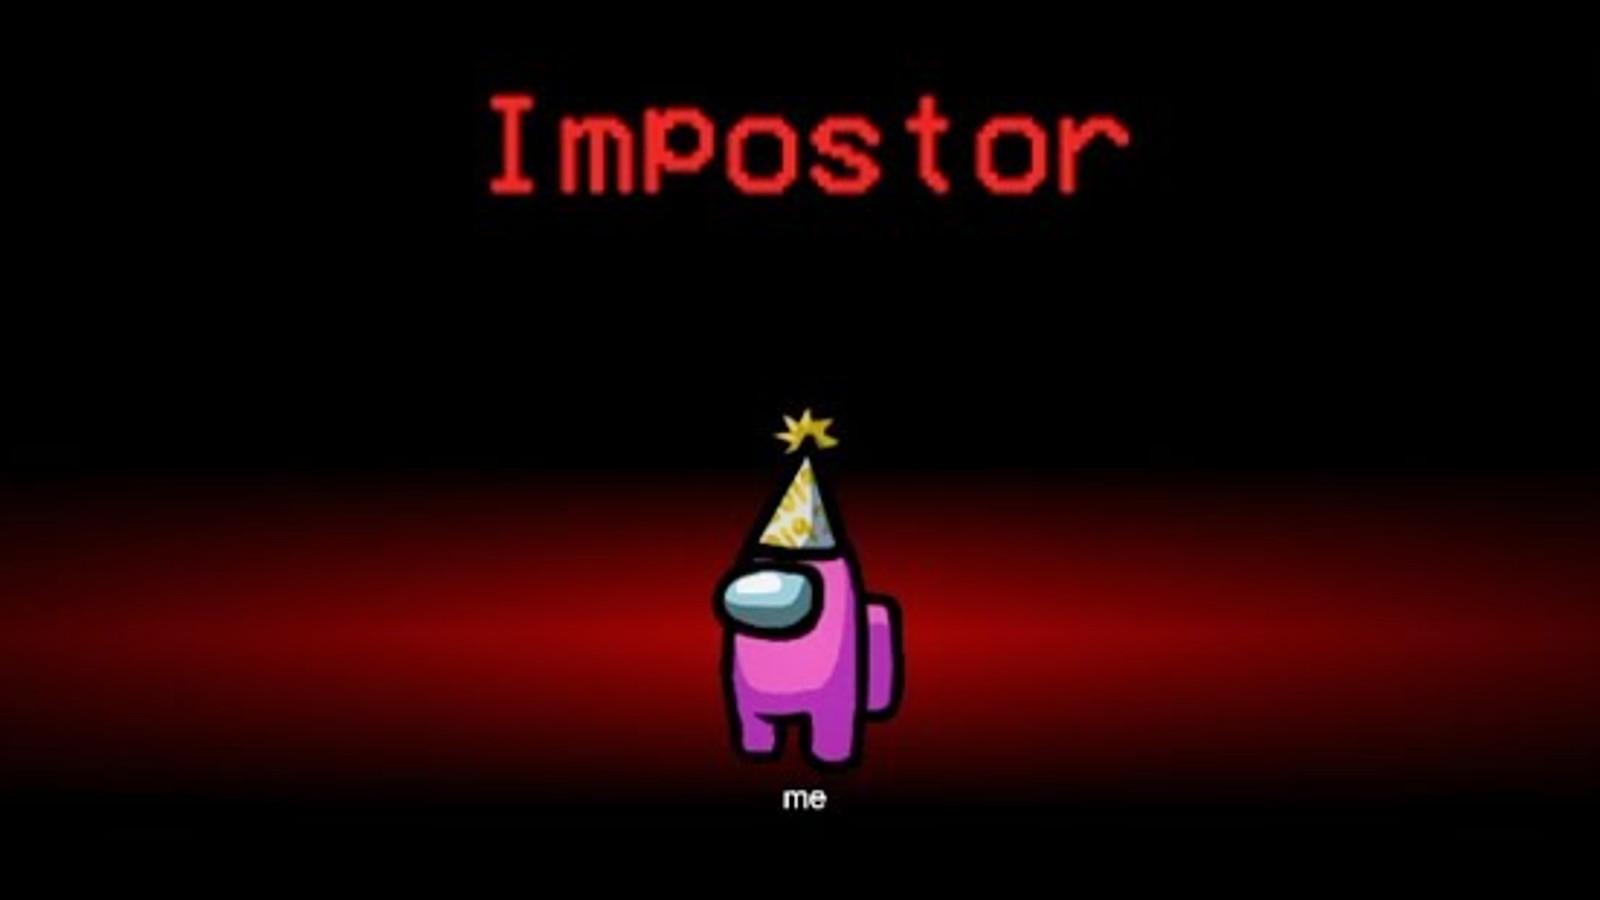 Among us 'Impostor' screen